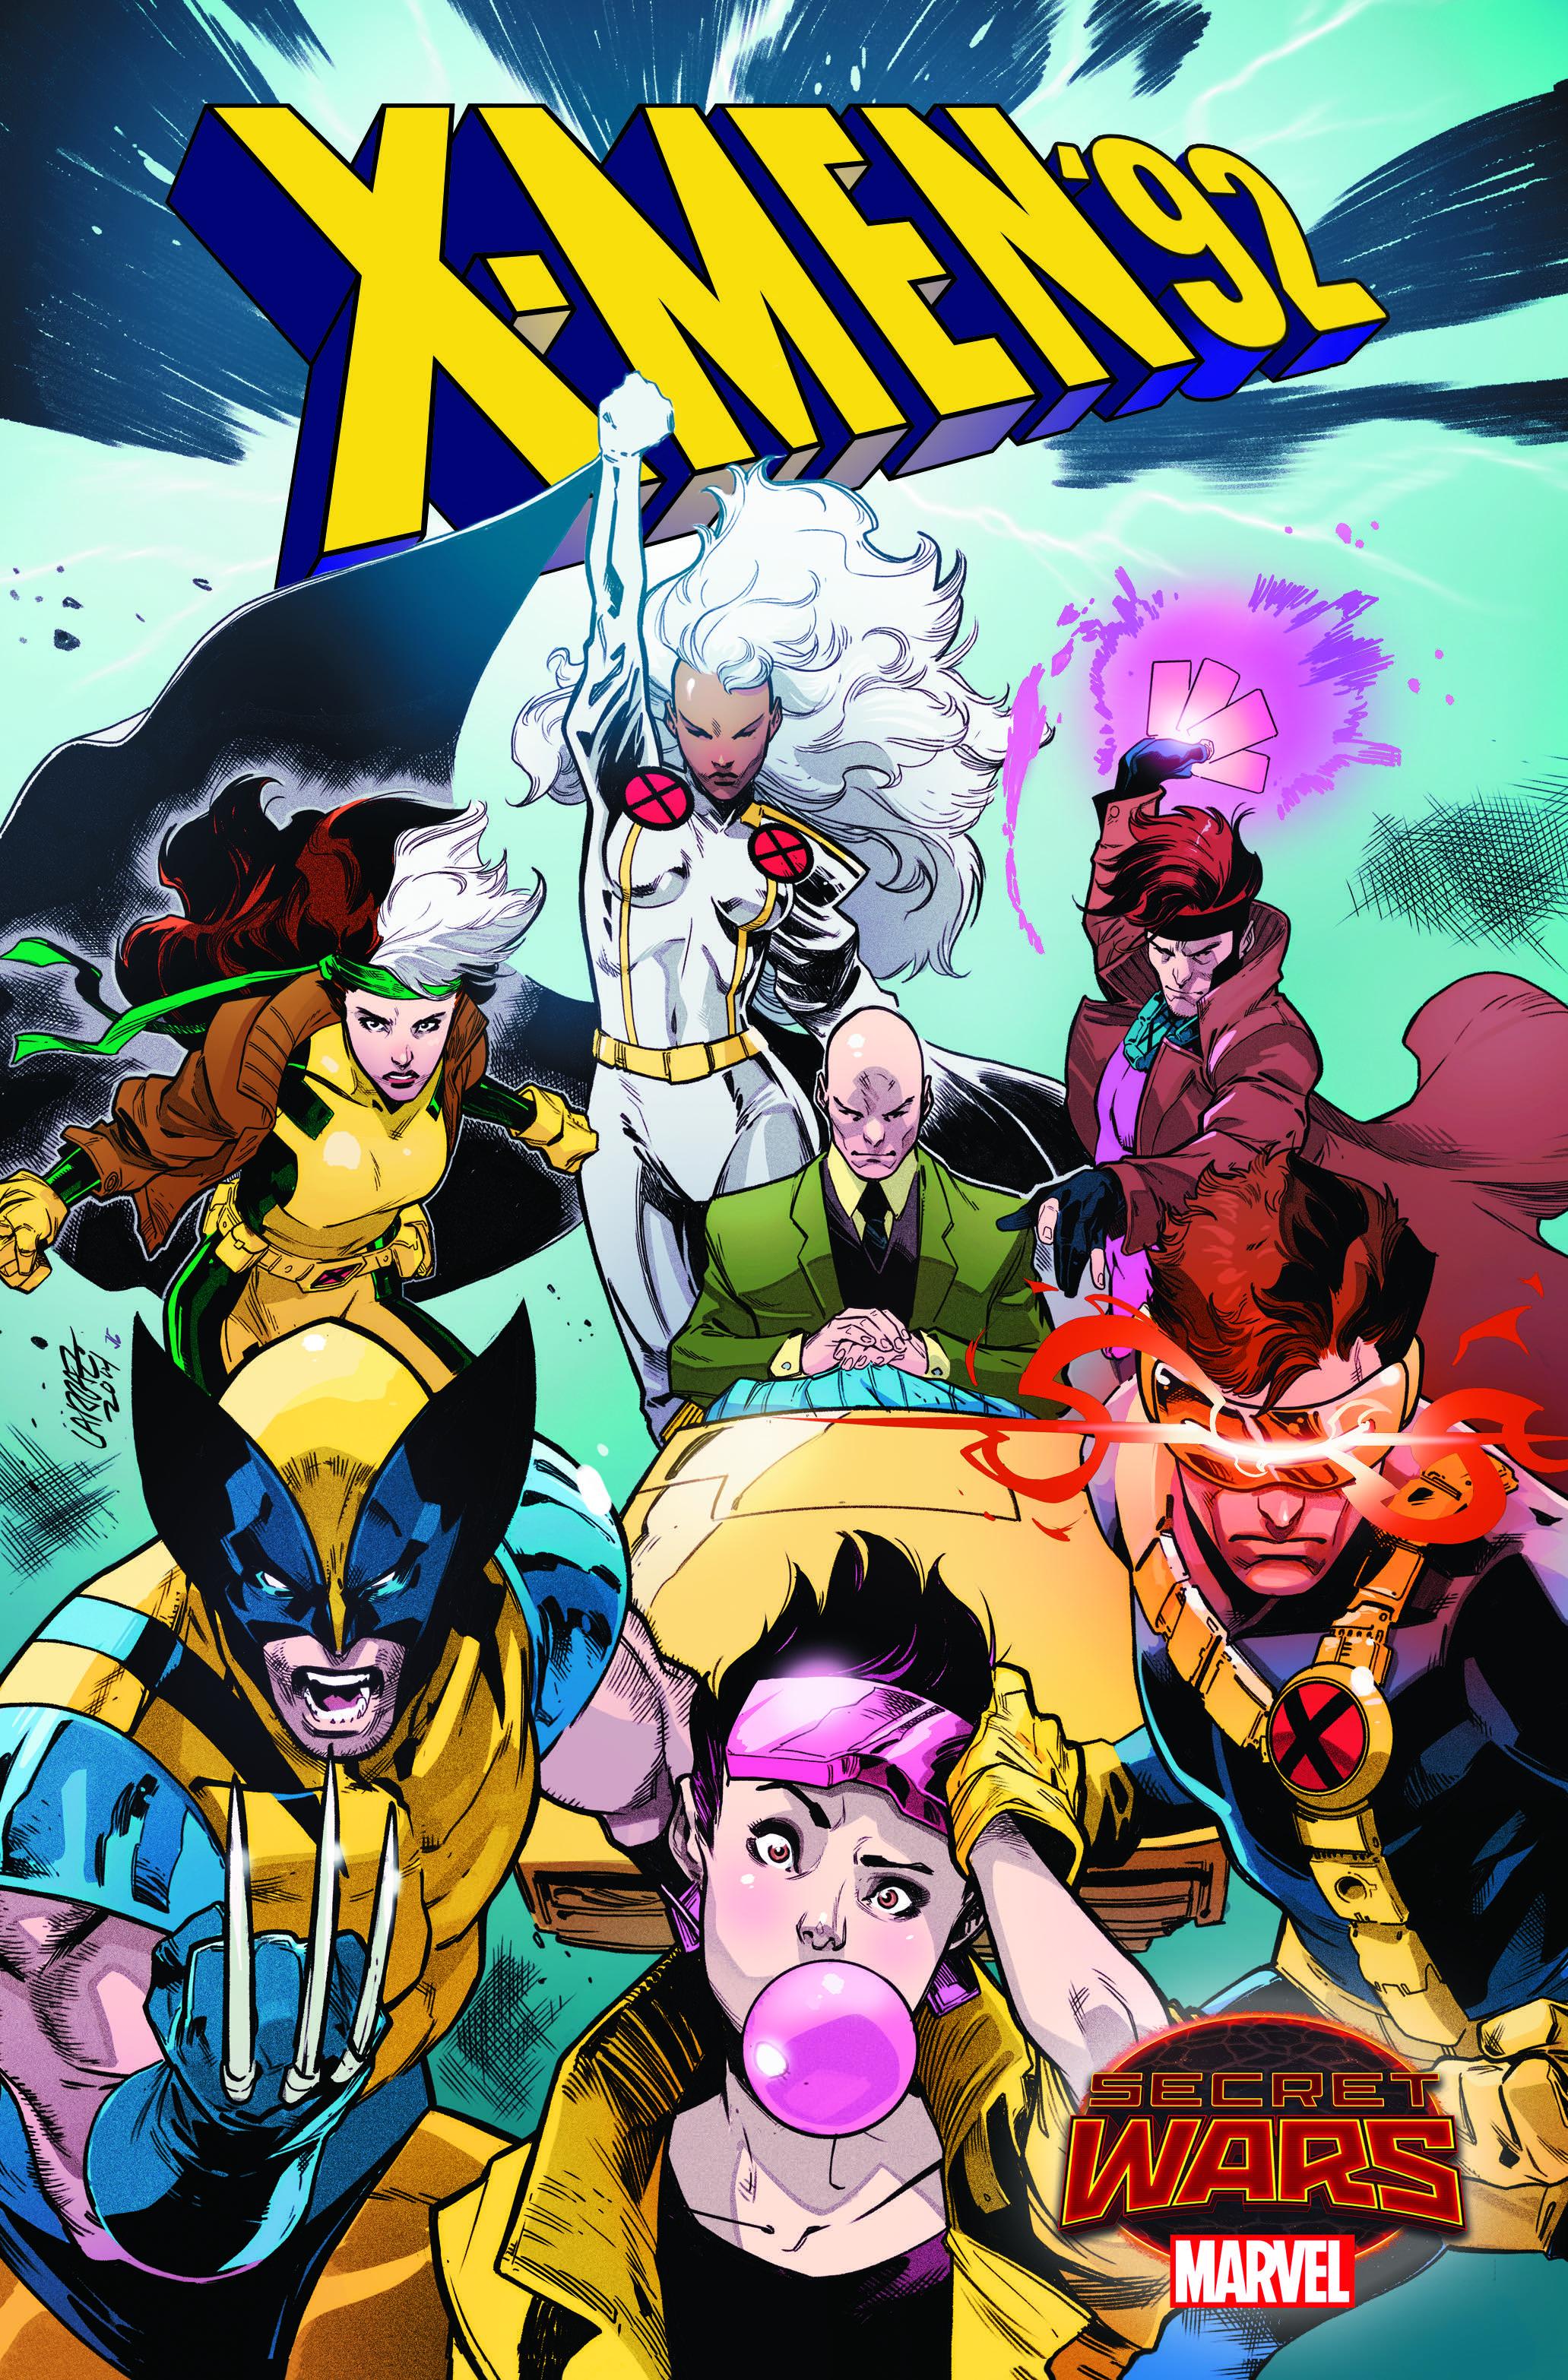 Marvel's X-Men: '92 #1 will bring the '90s cartoon X-Men to modern comics